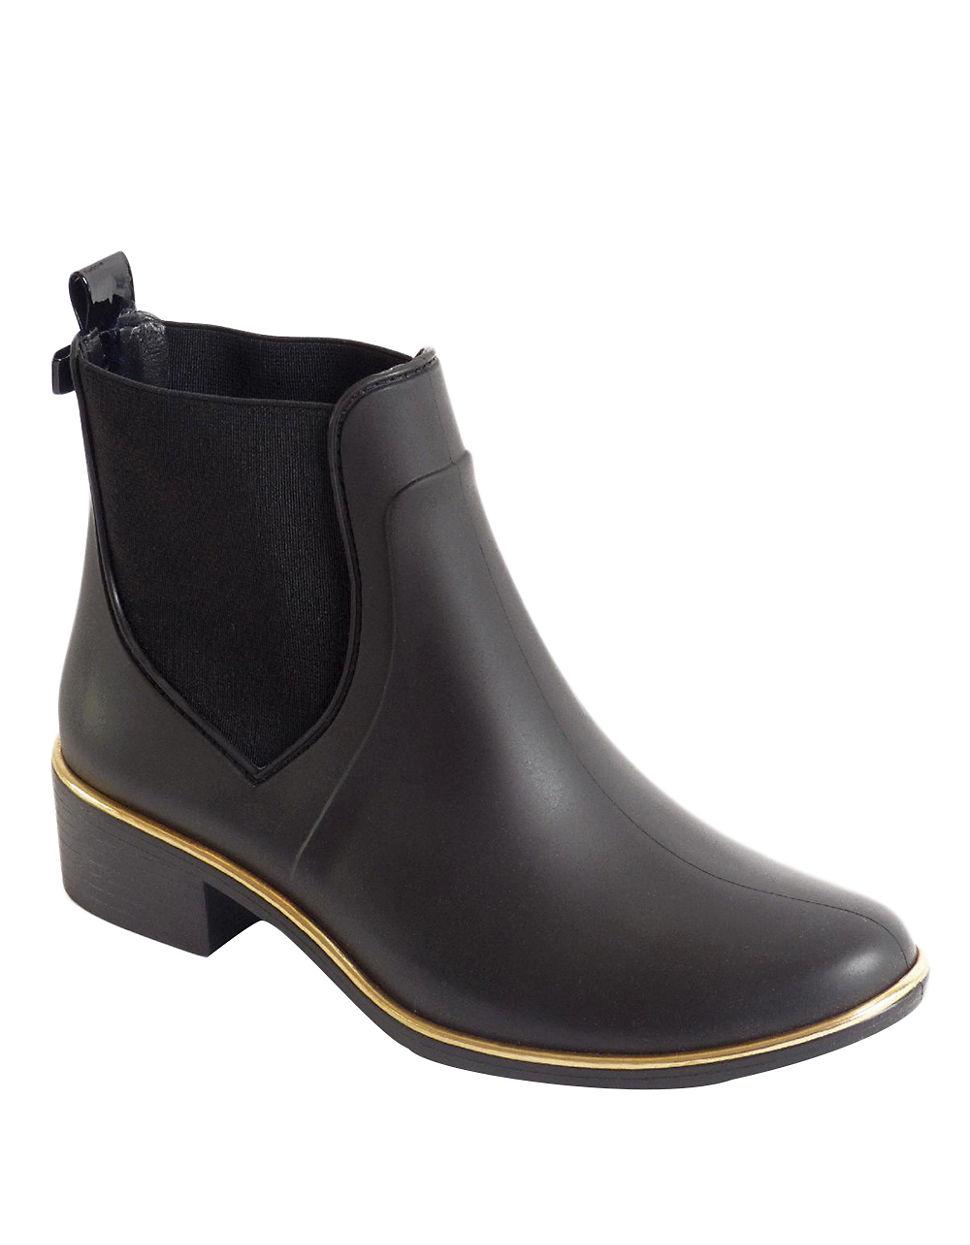 Kate spade new york Sedgewick Rubber Rain Boots in Black ...